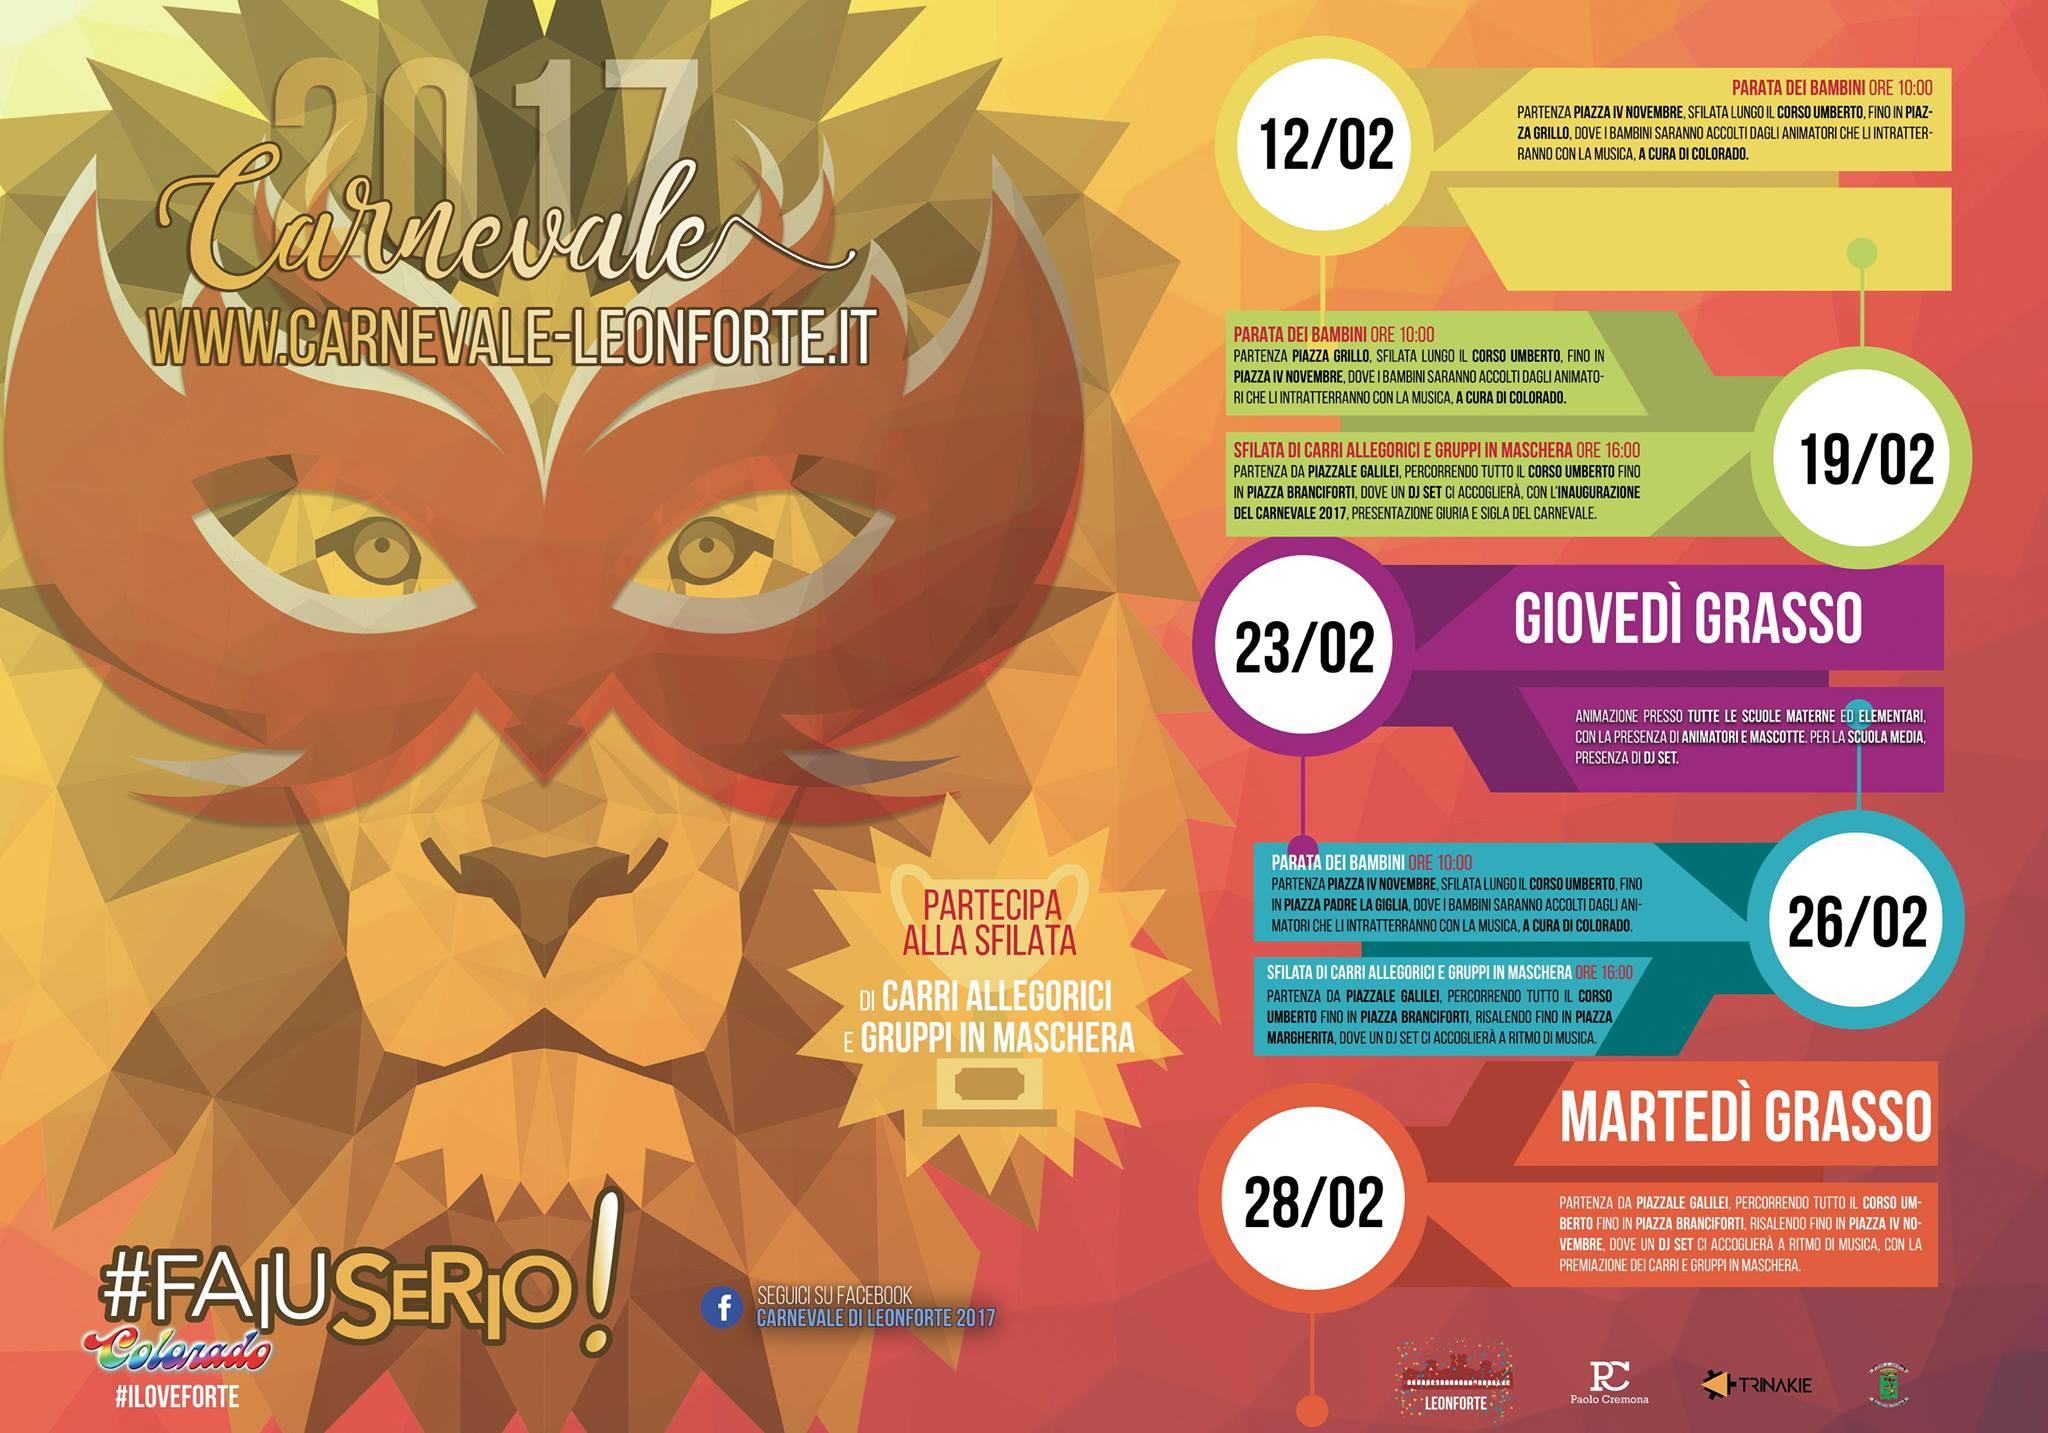 Programma carnevale 2017